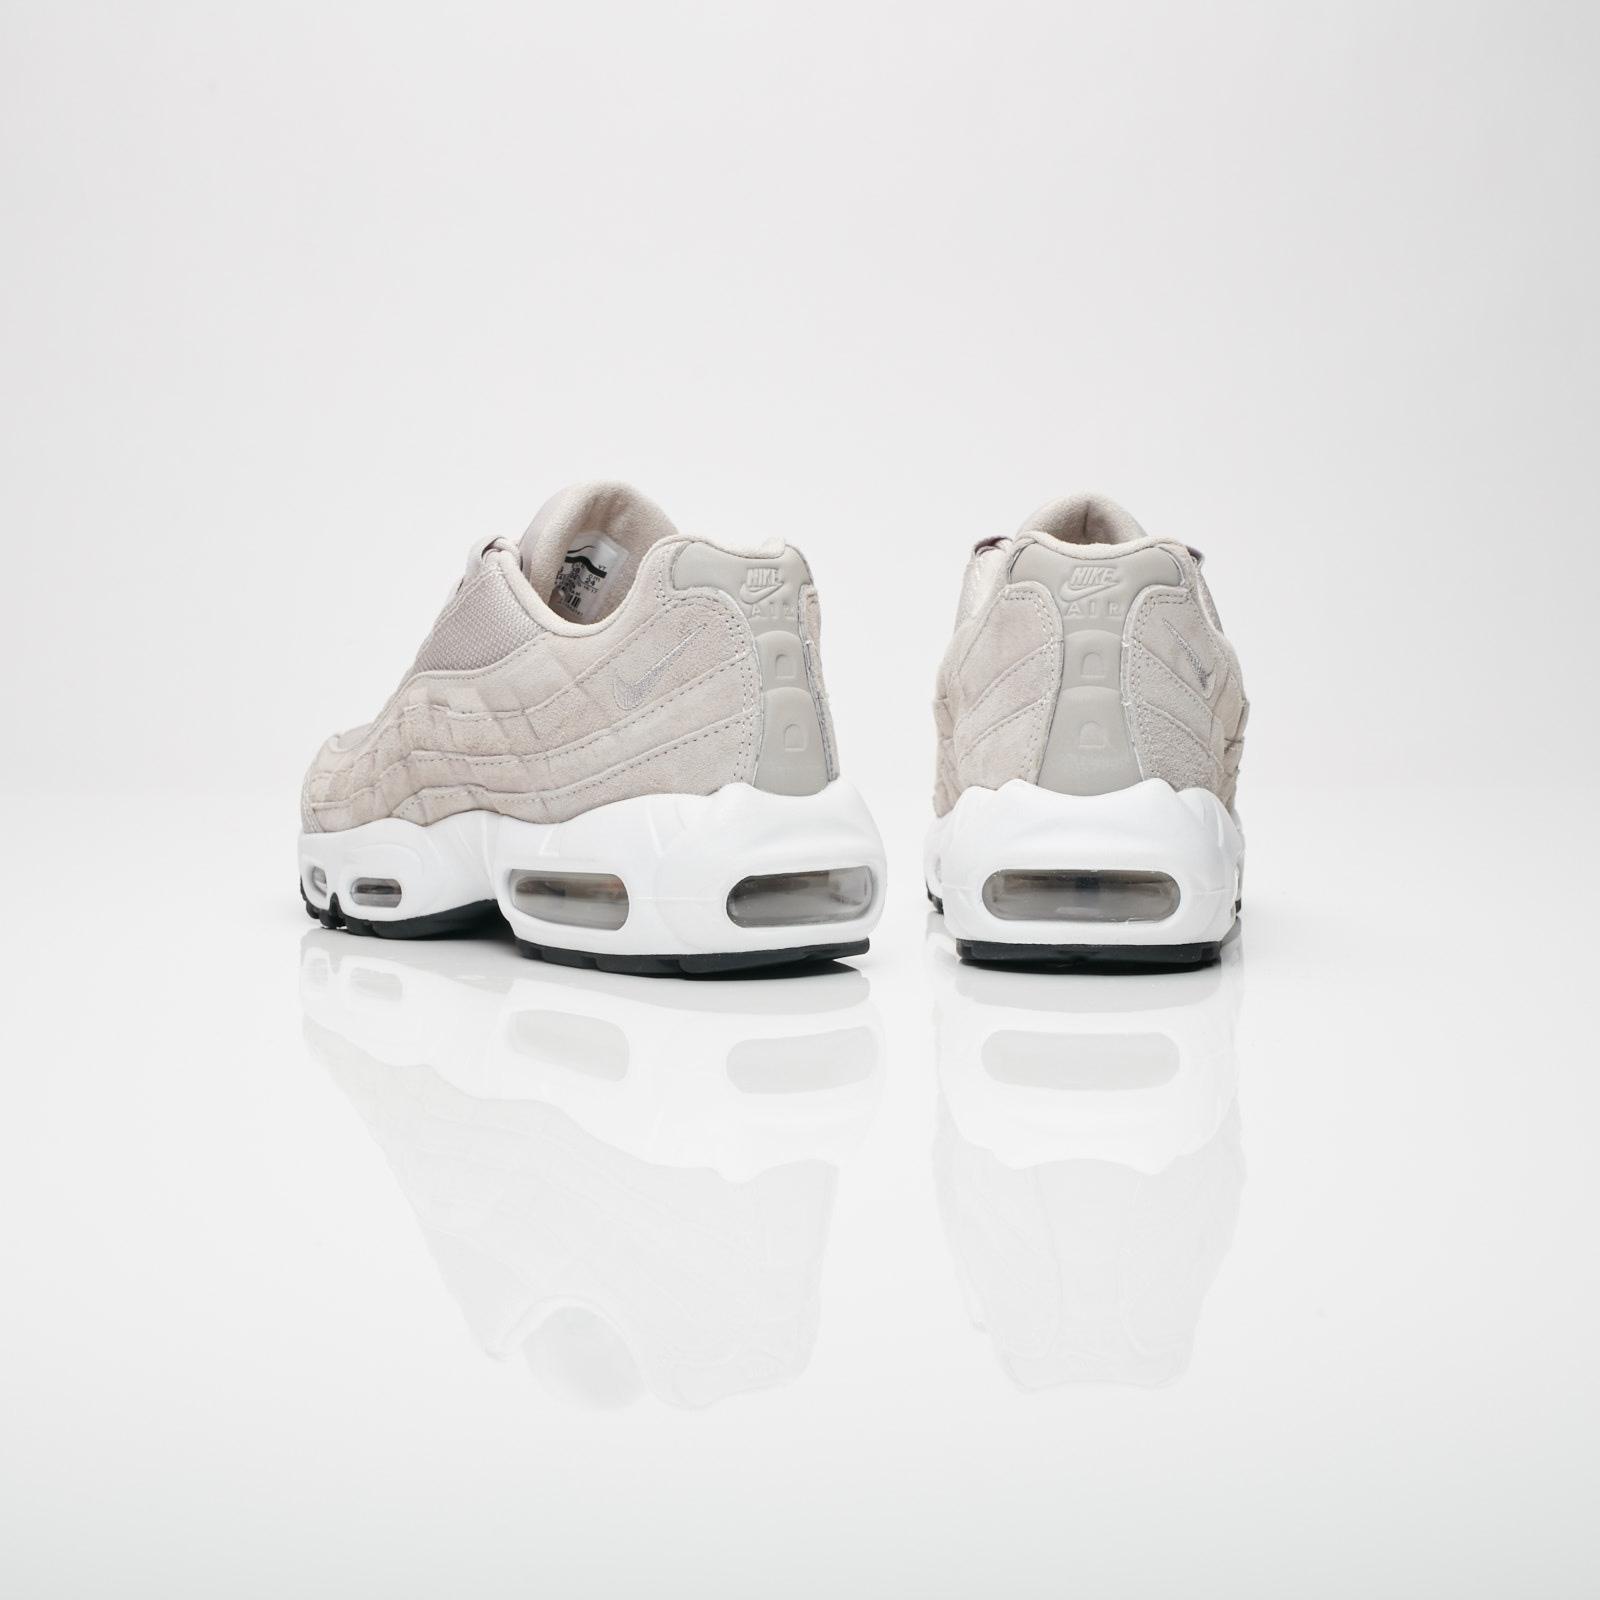 Nike Wmns Air Max 95 Premium 807443 011 Sneakersnstuff